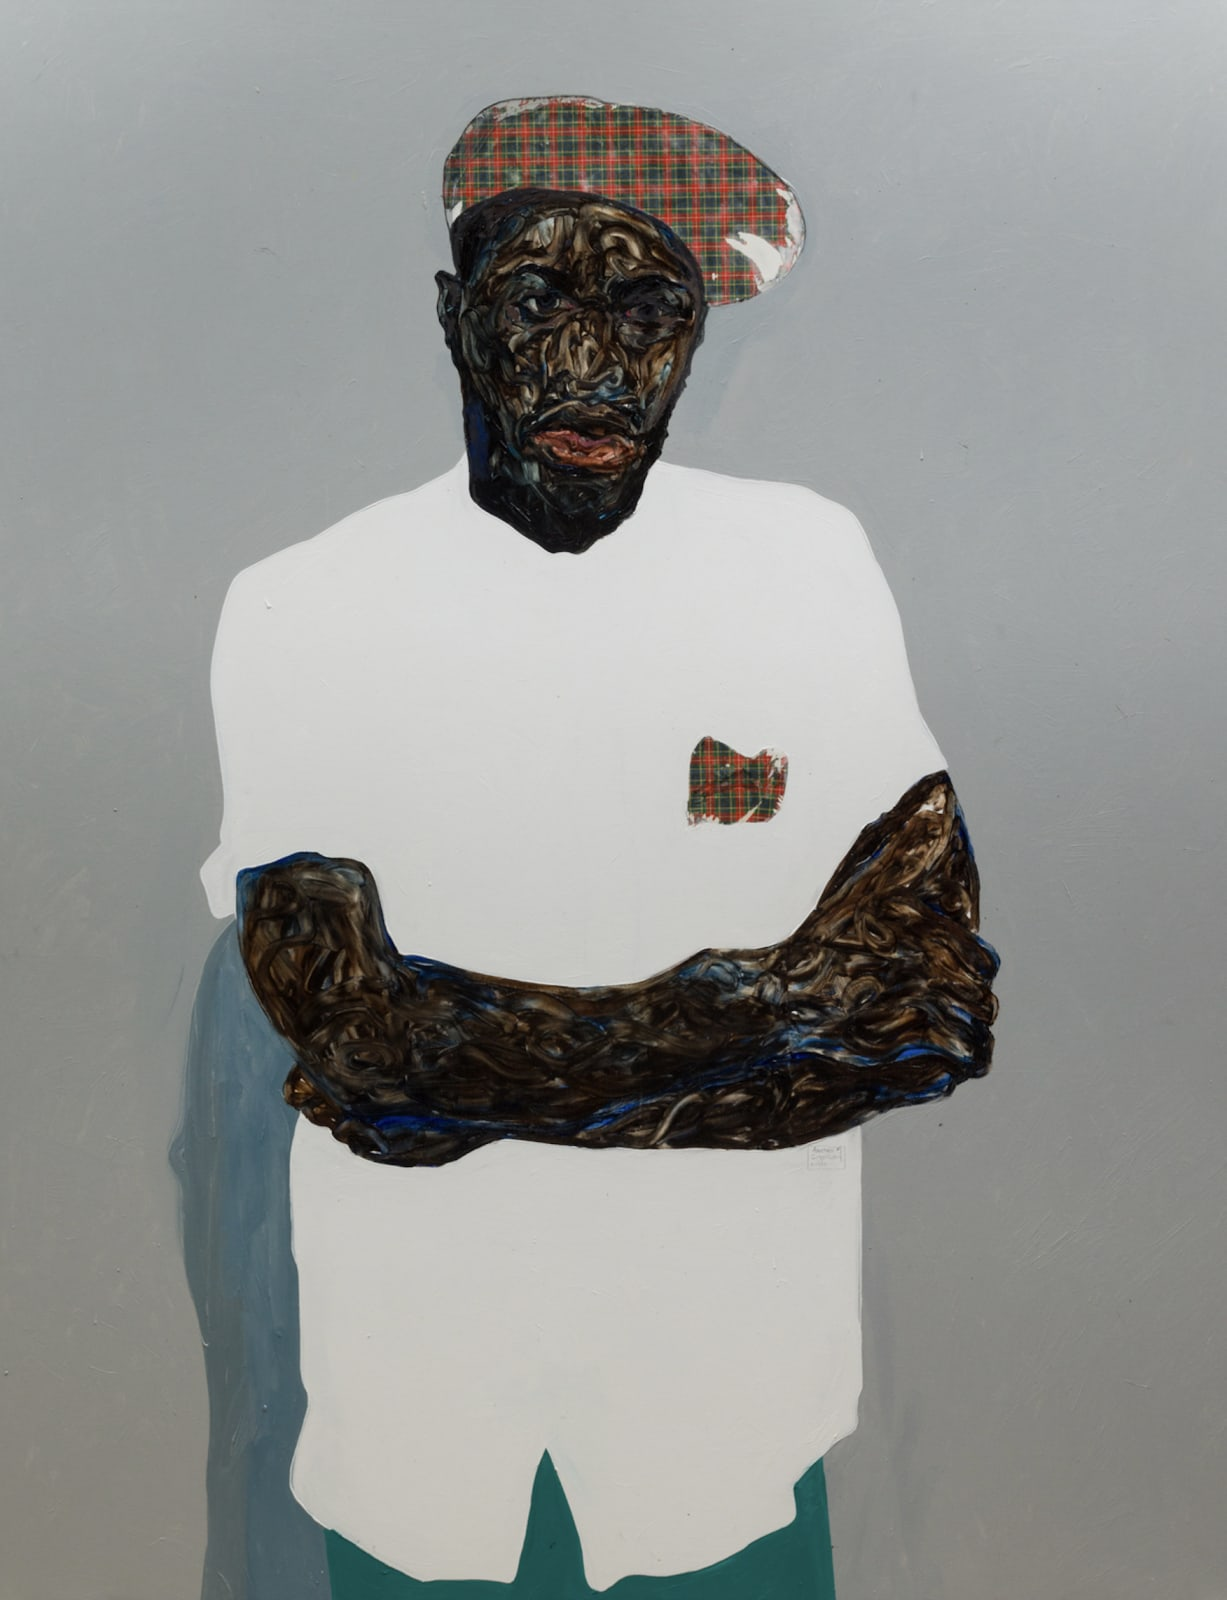 Amoako Boafo, Checkered beret, 2020